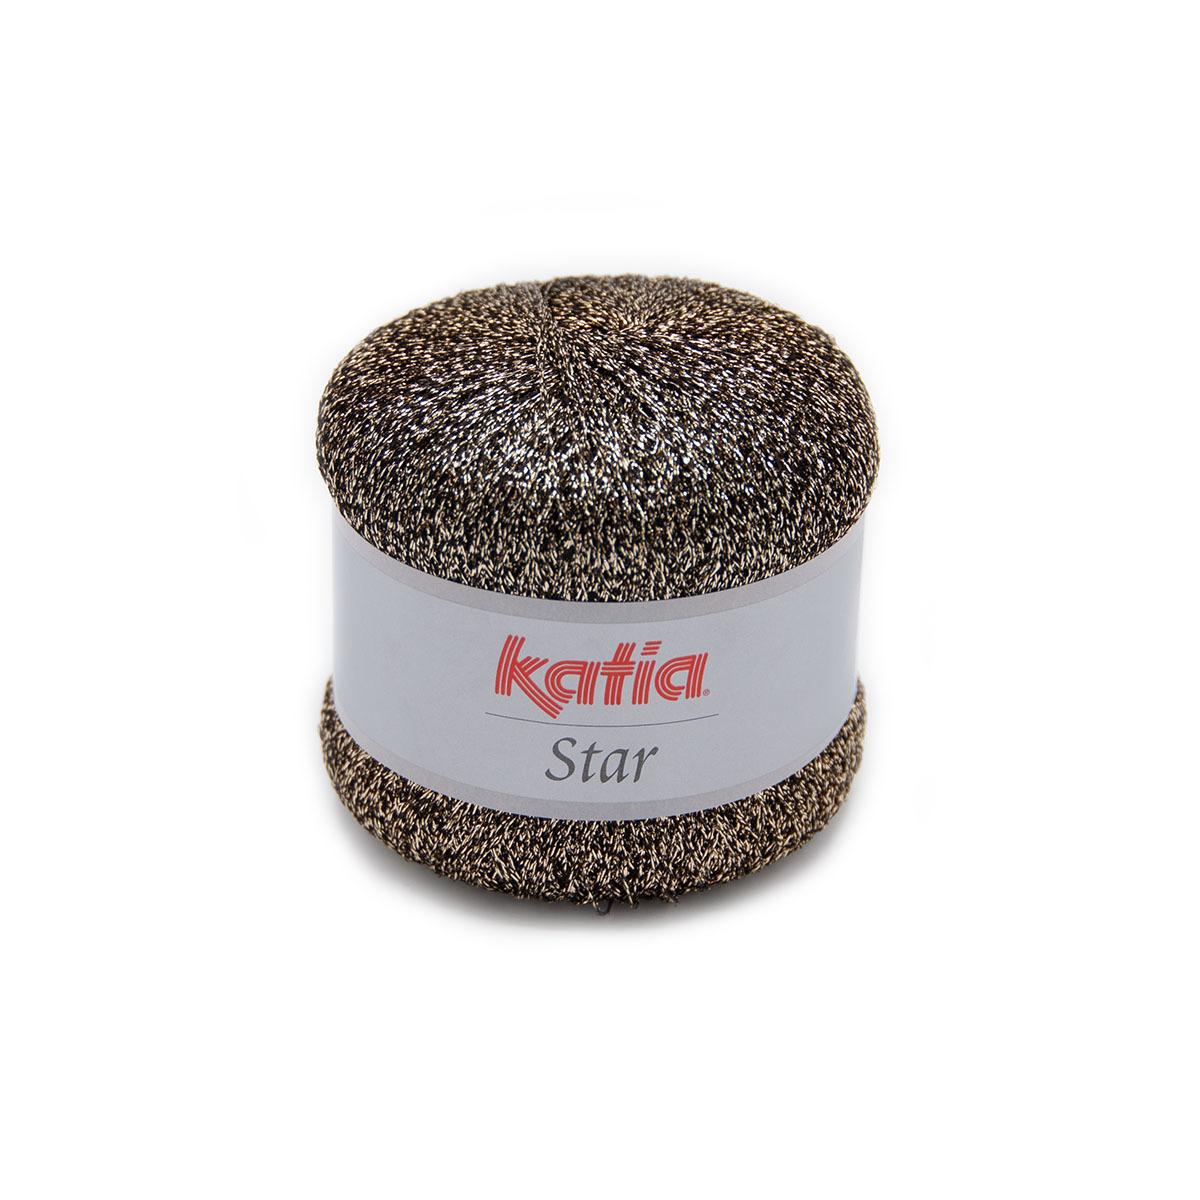 Katia Star - 503